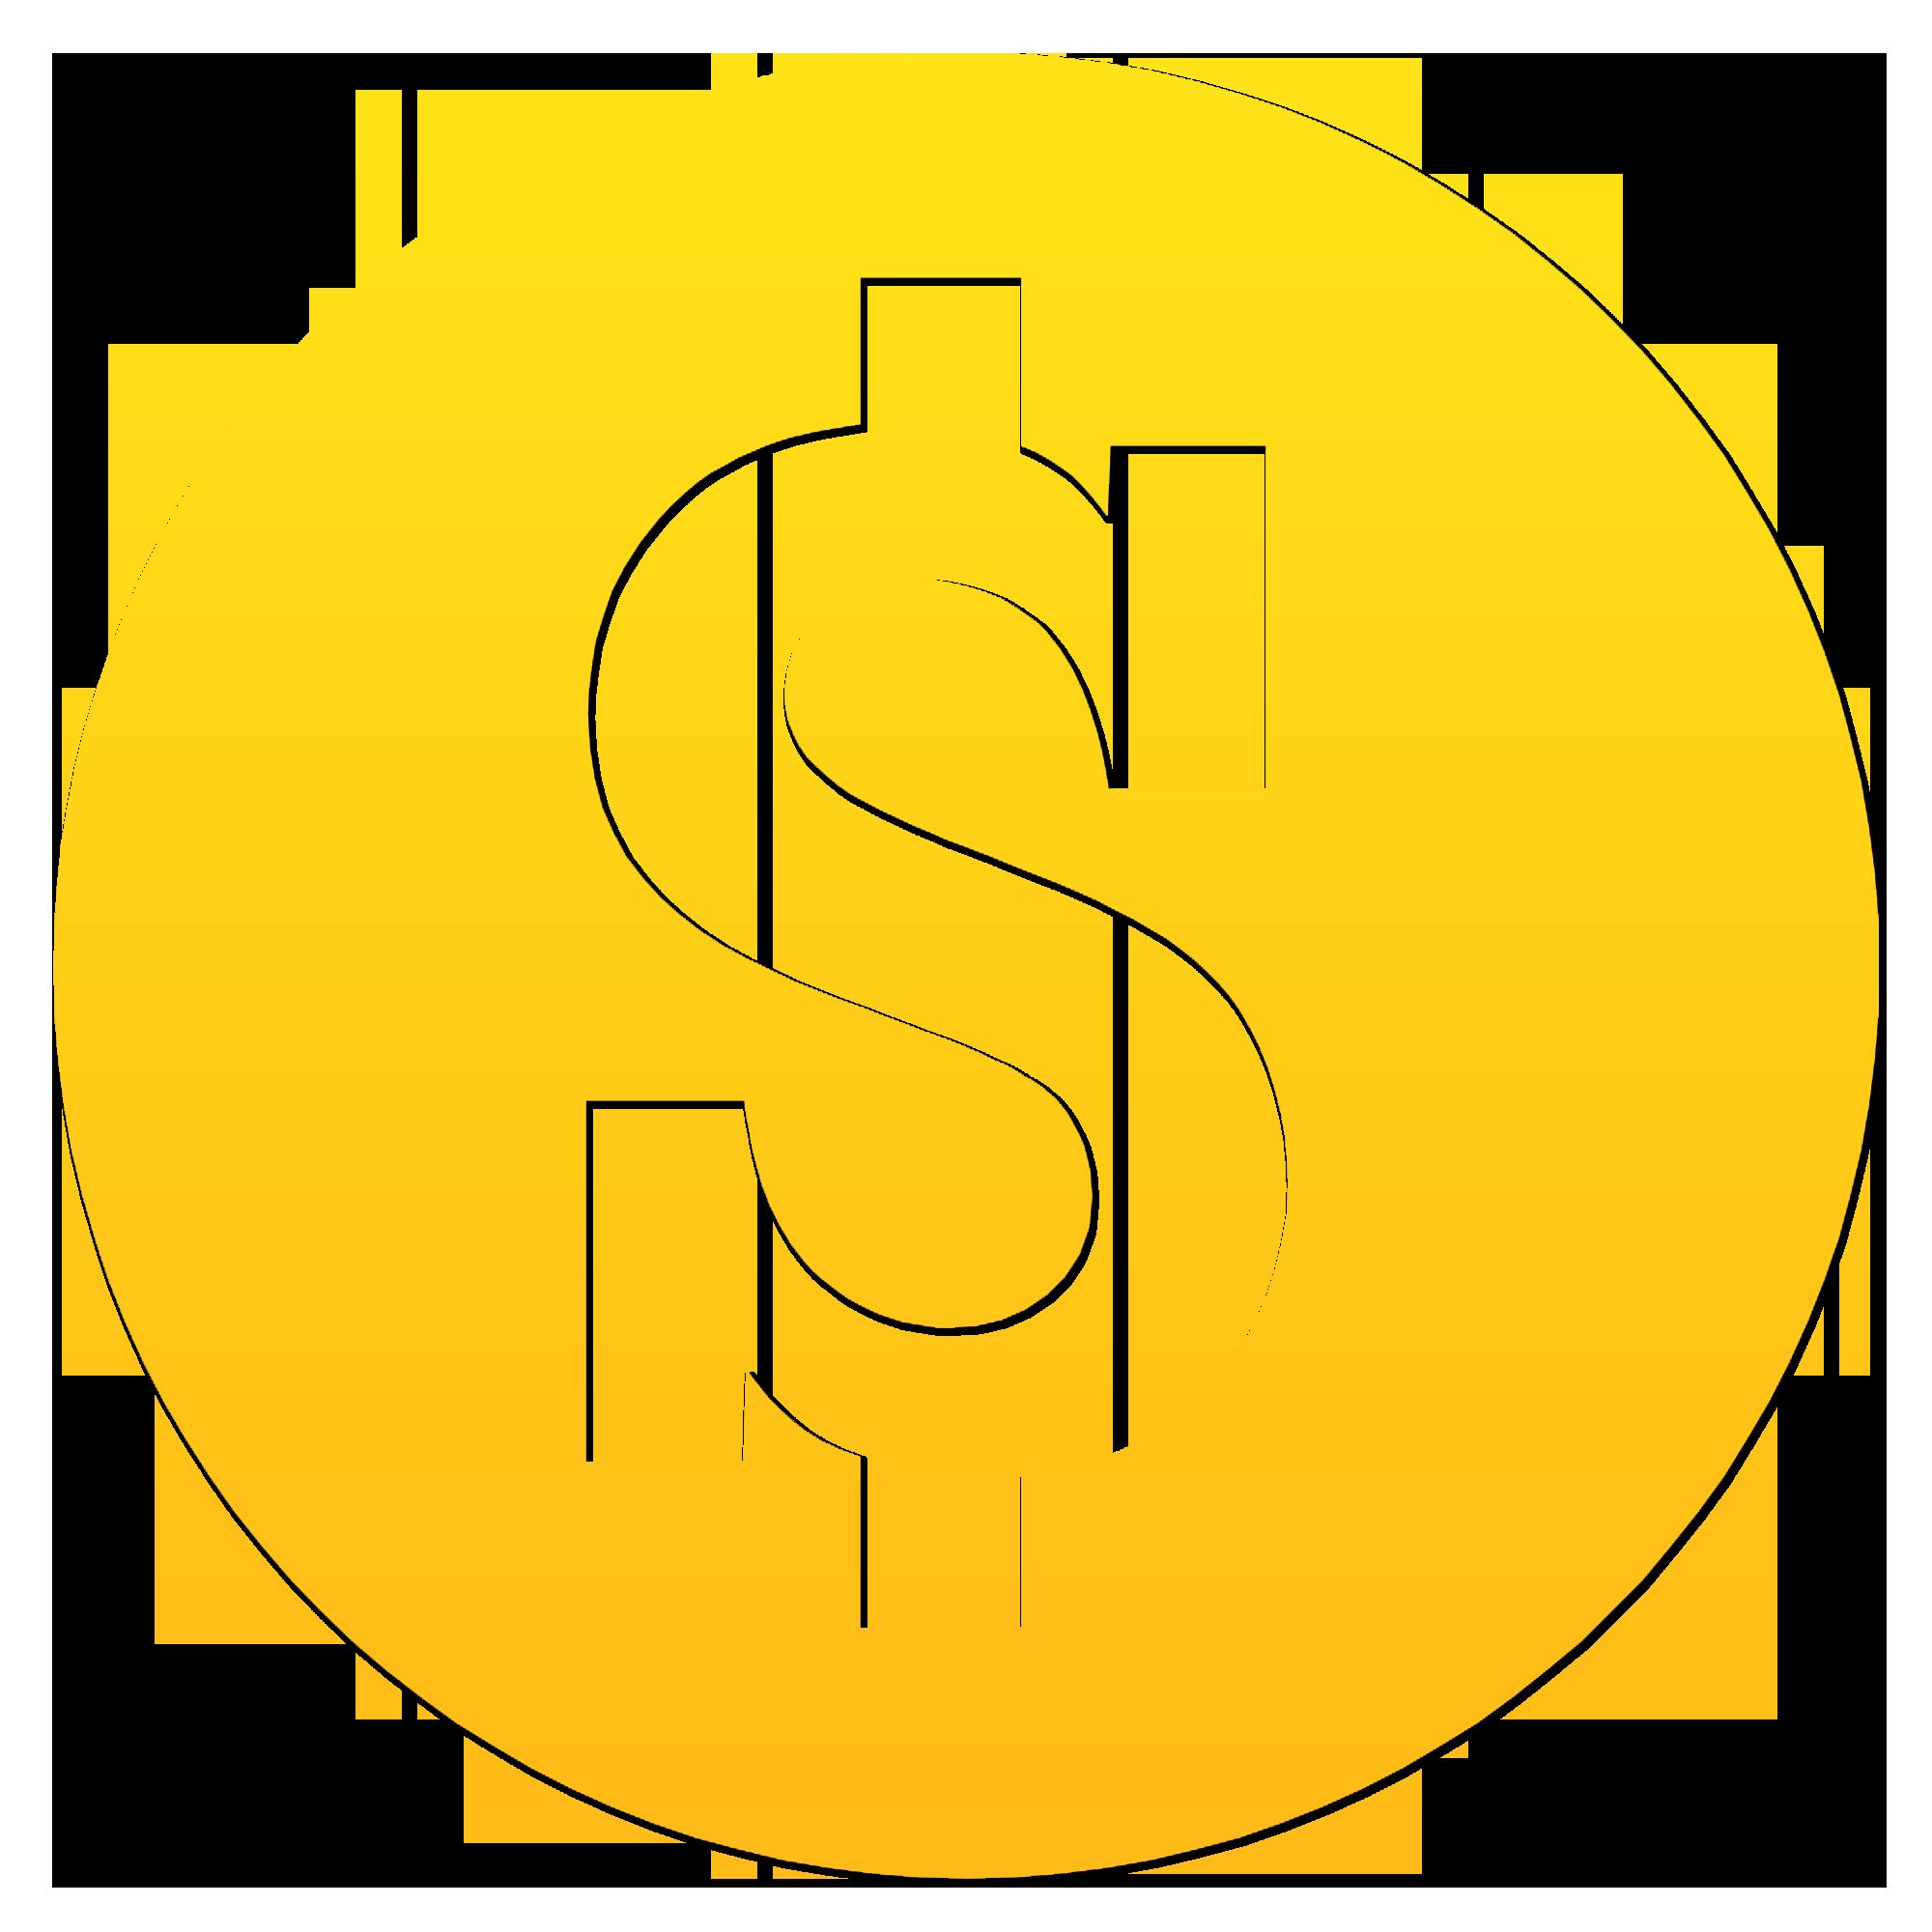 Dollar photos clipart transparentpng. Money sign icon png